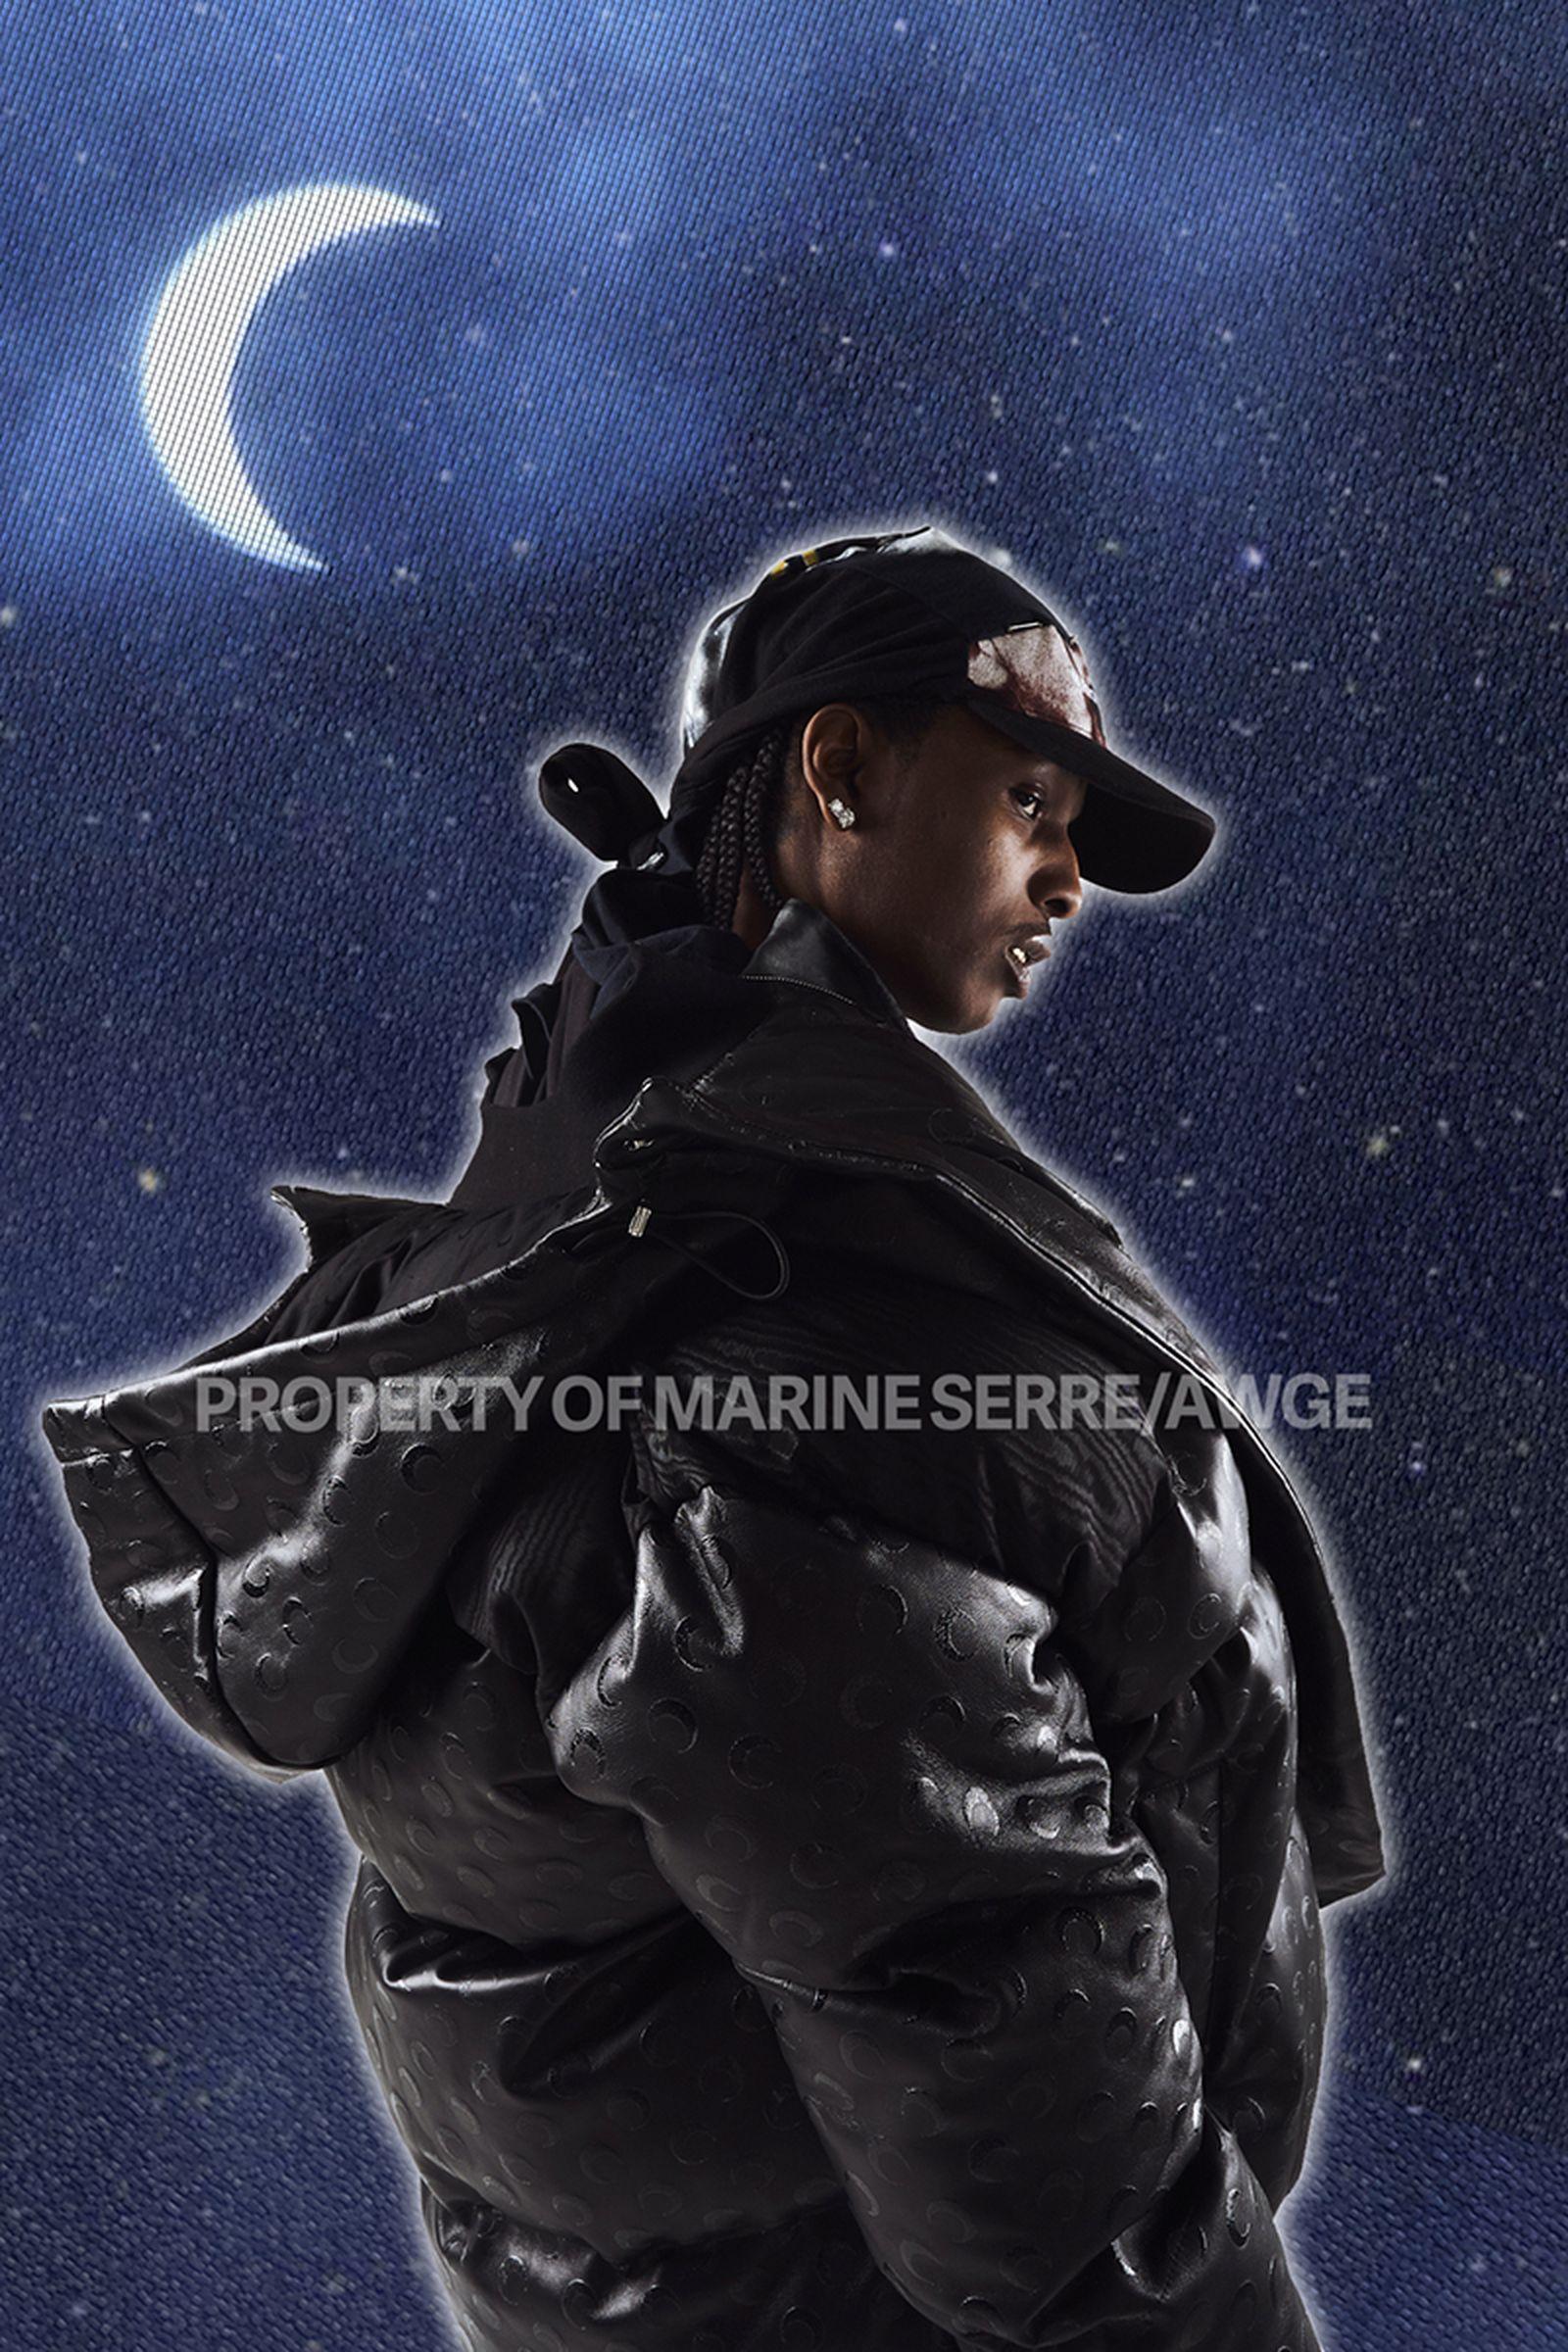 marine-serre-awge-regenerated-collection-02